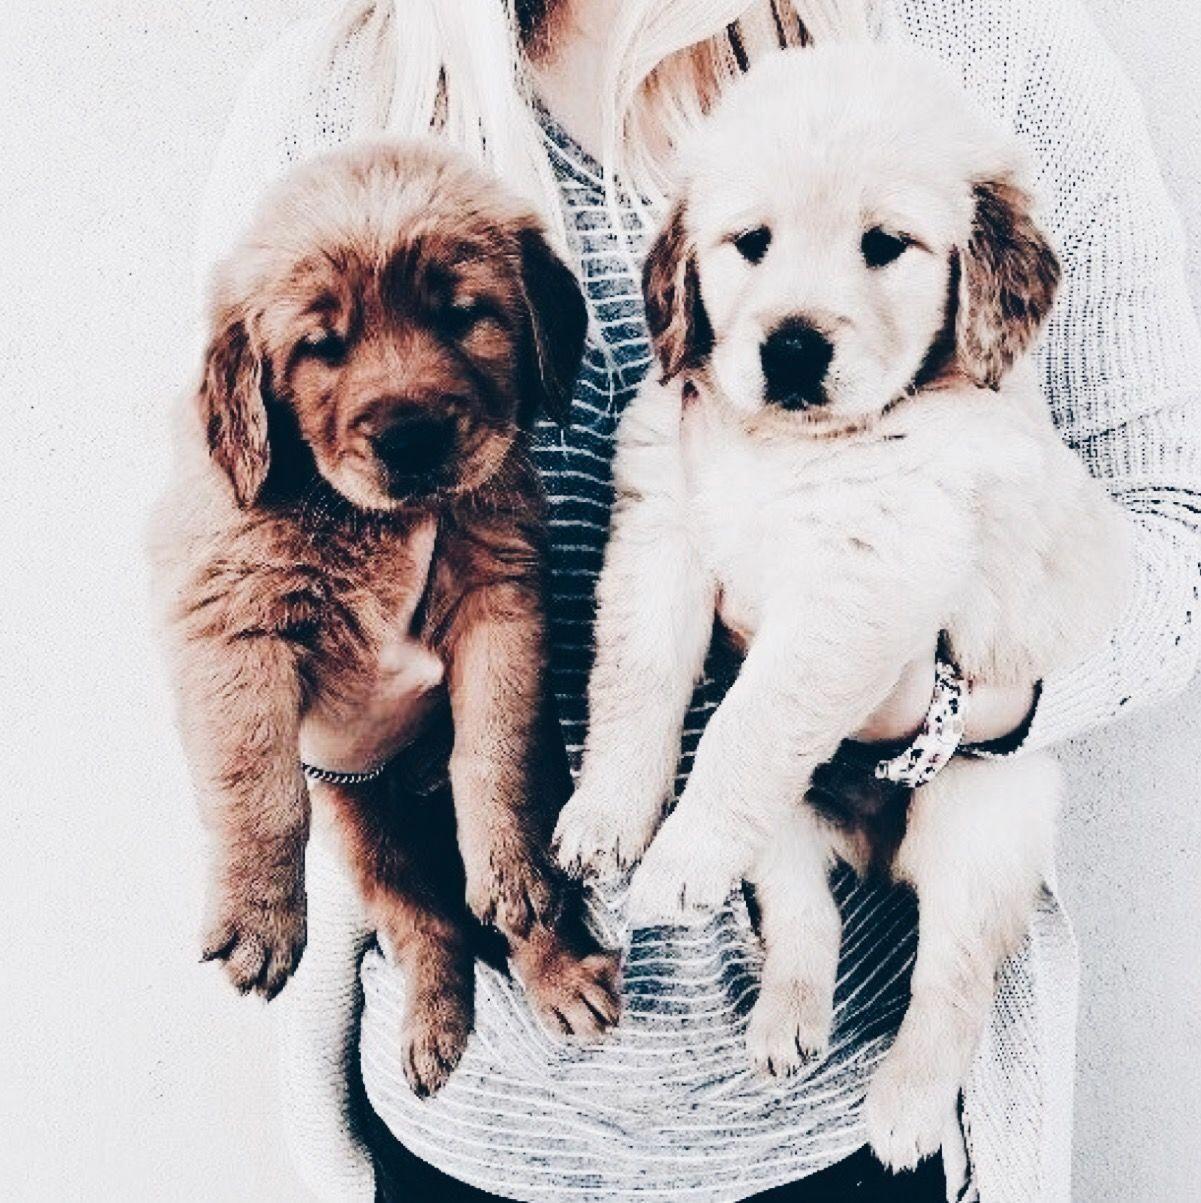 Yielding Dog Training Heel Dog Pinkdogsaccessories Cute Dogs